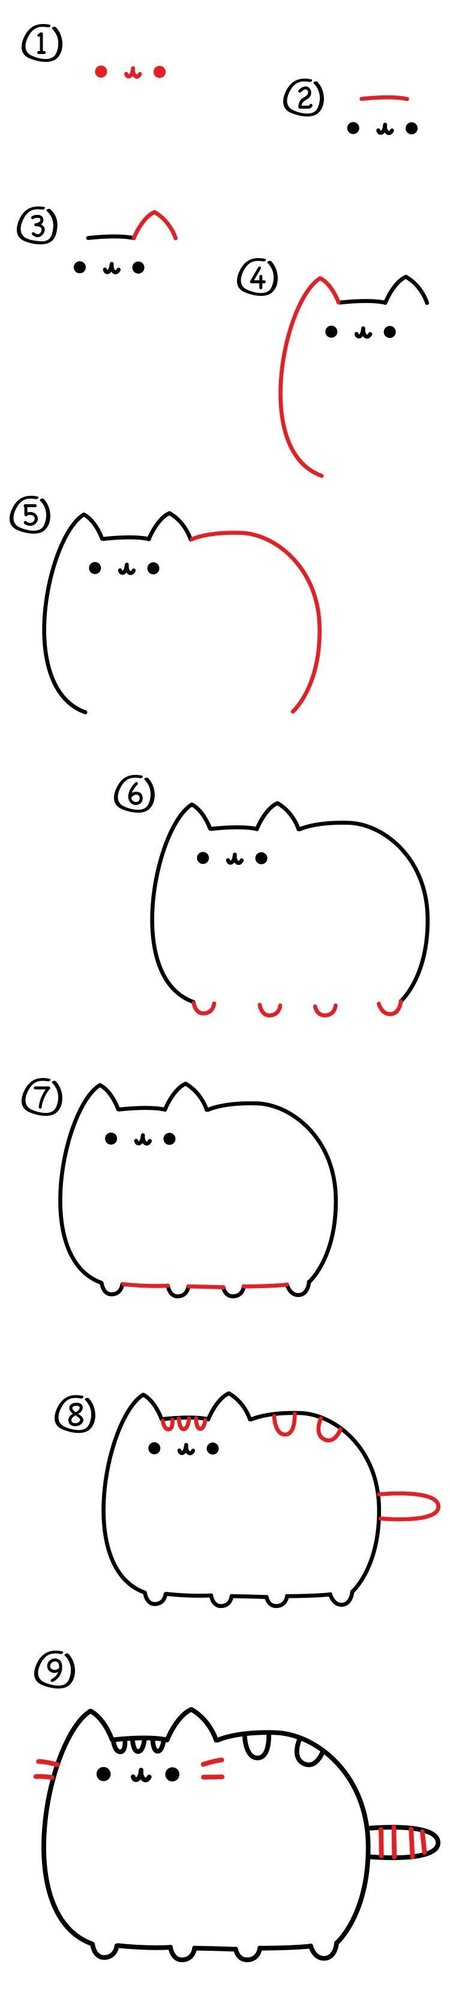 dibujos fáciles pusheen paso a paso personajes famosos animados dibujar este personaje cartoon gatos gato